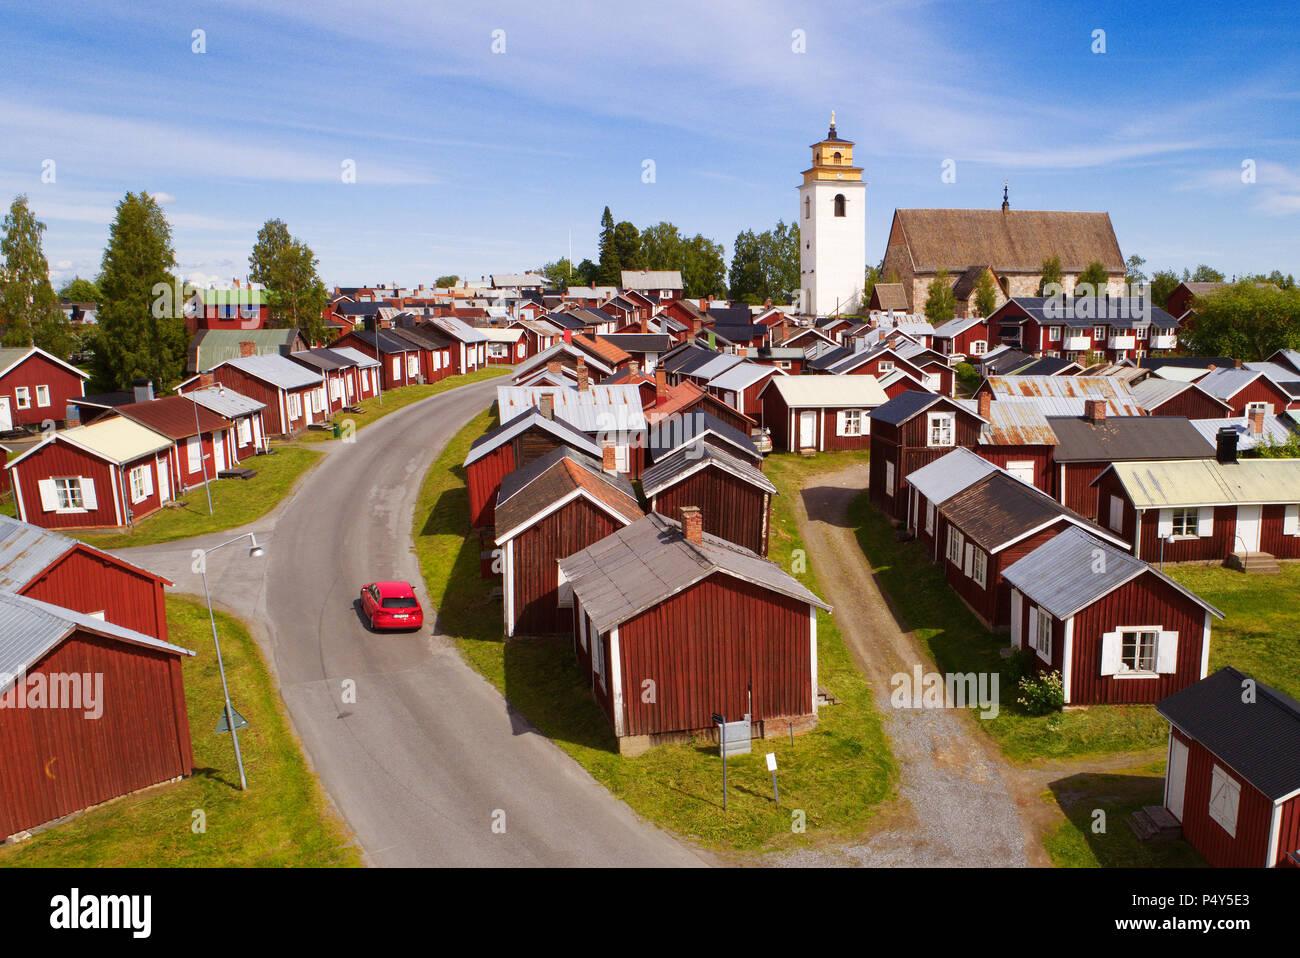 Storforsen to Gammelstad - 7 ways to travel via train, plane